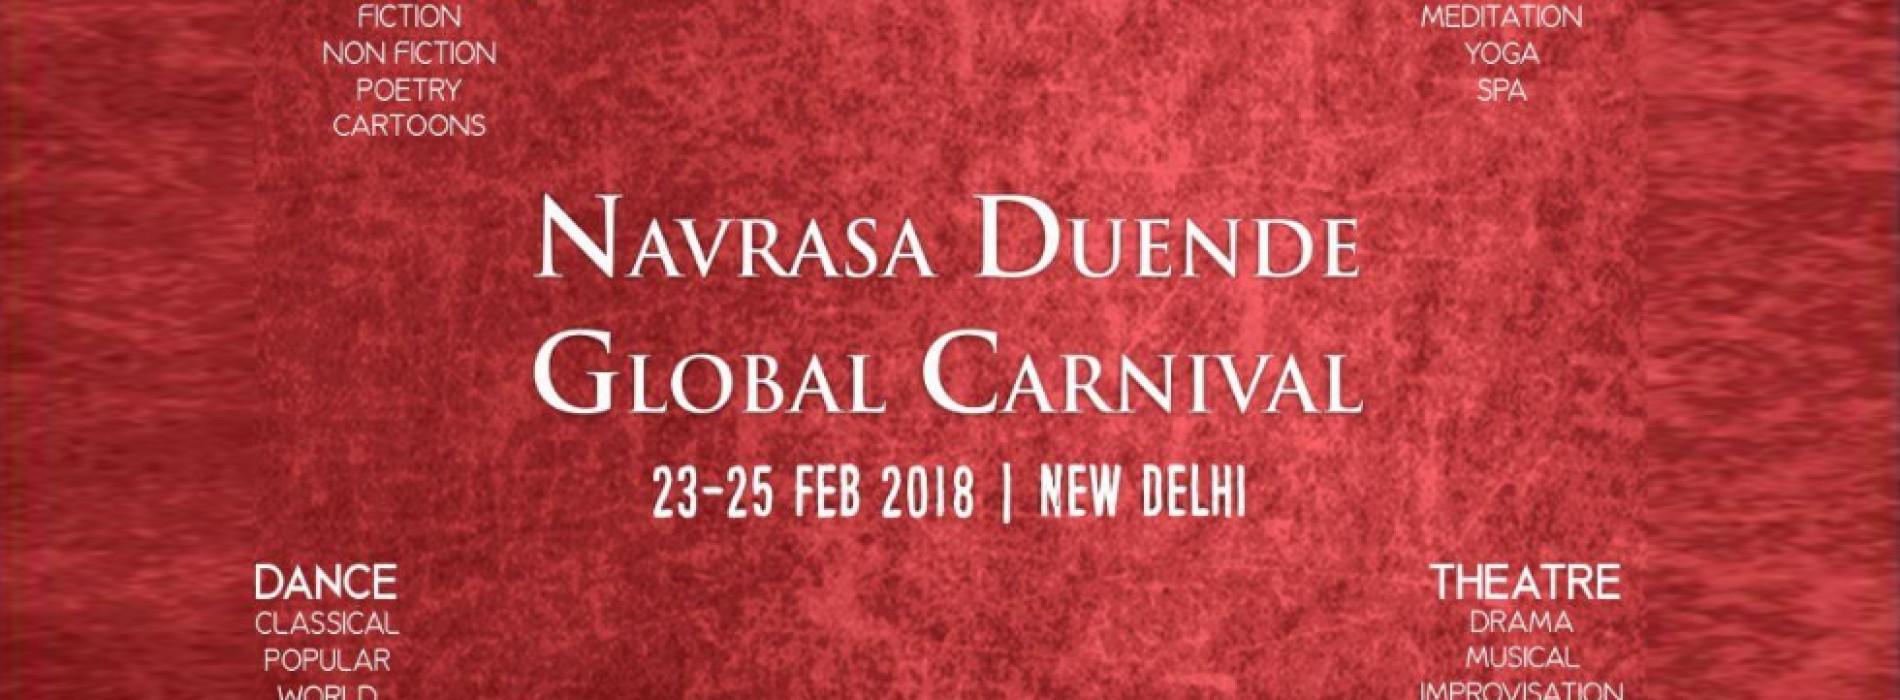 Navrasa Duende Global Carnival 2018